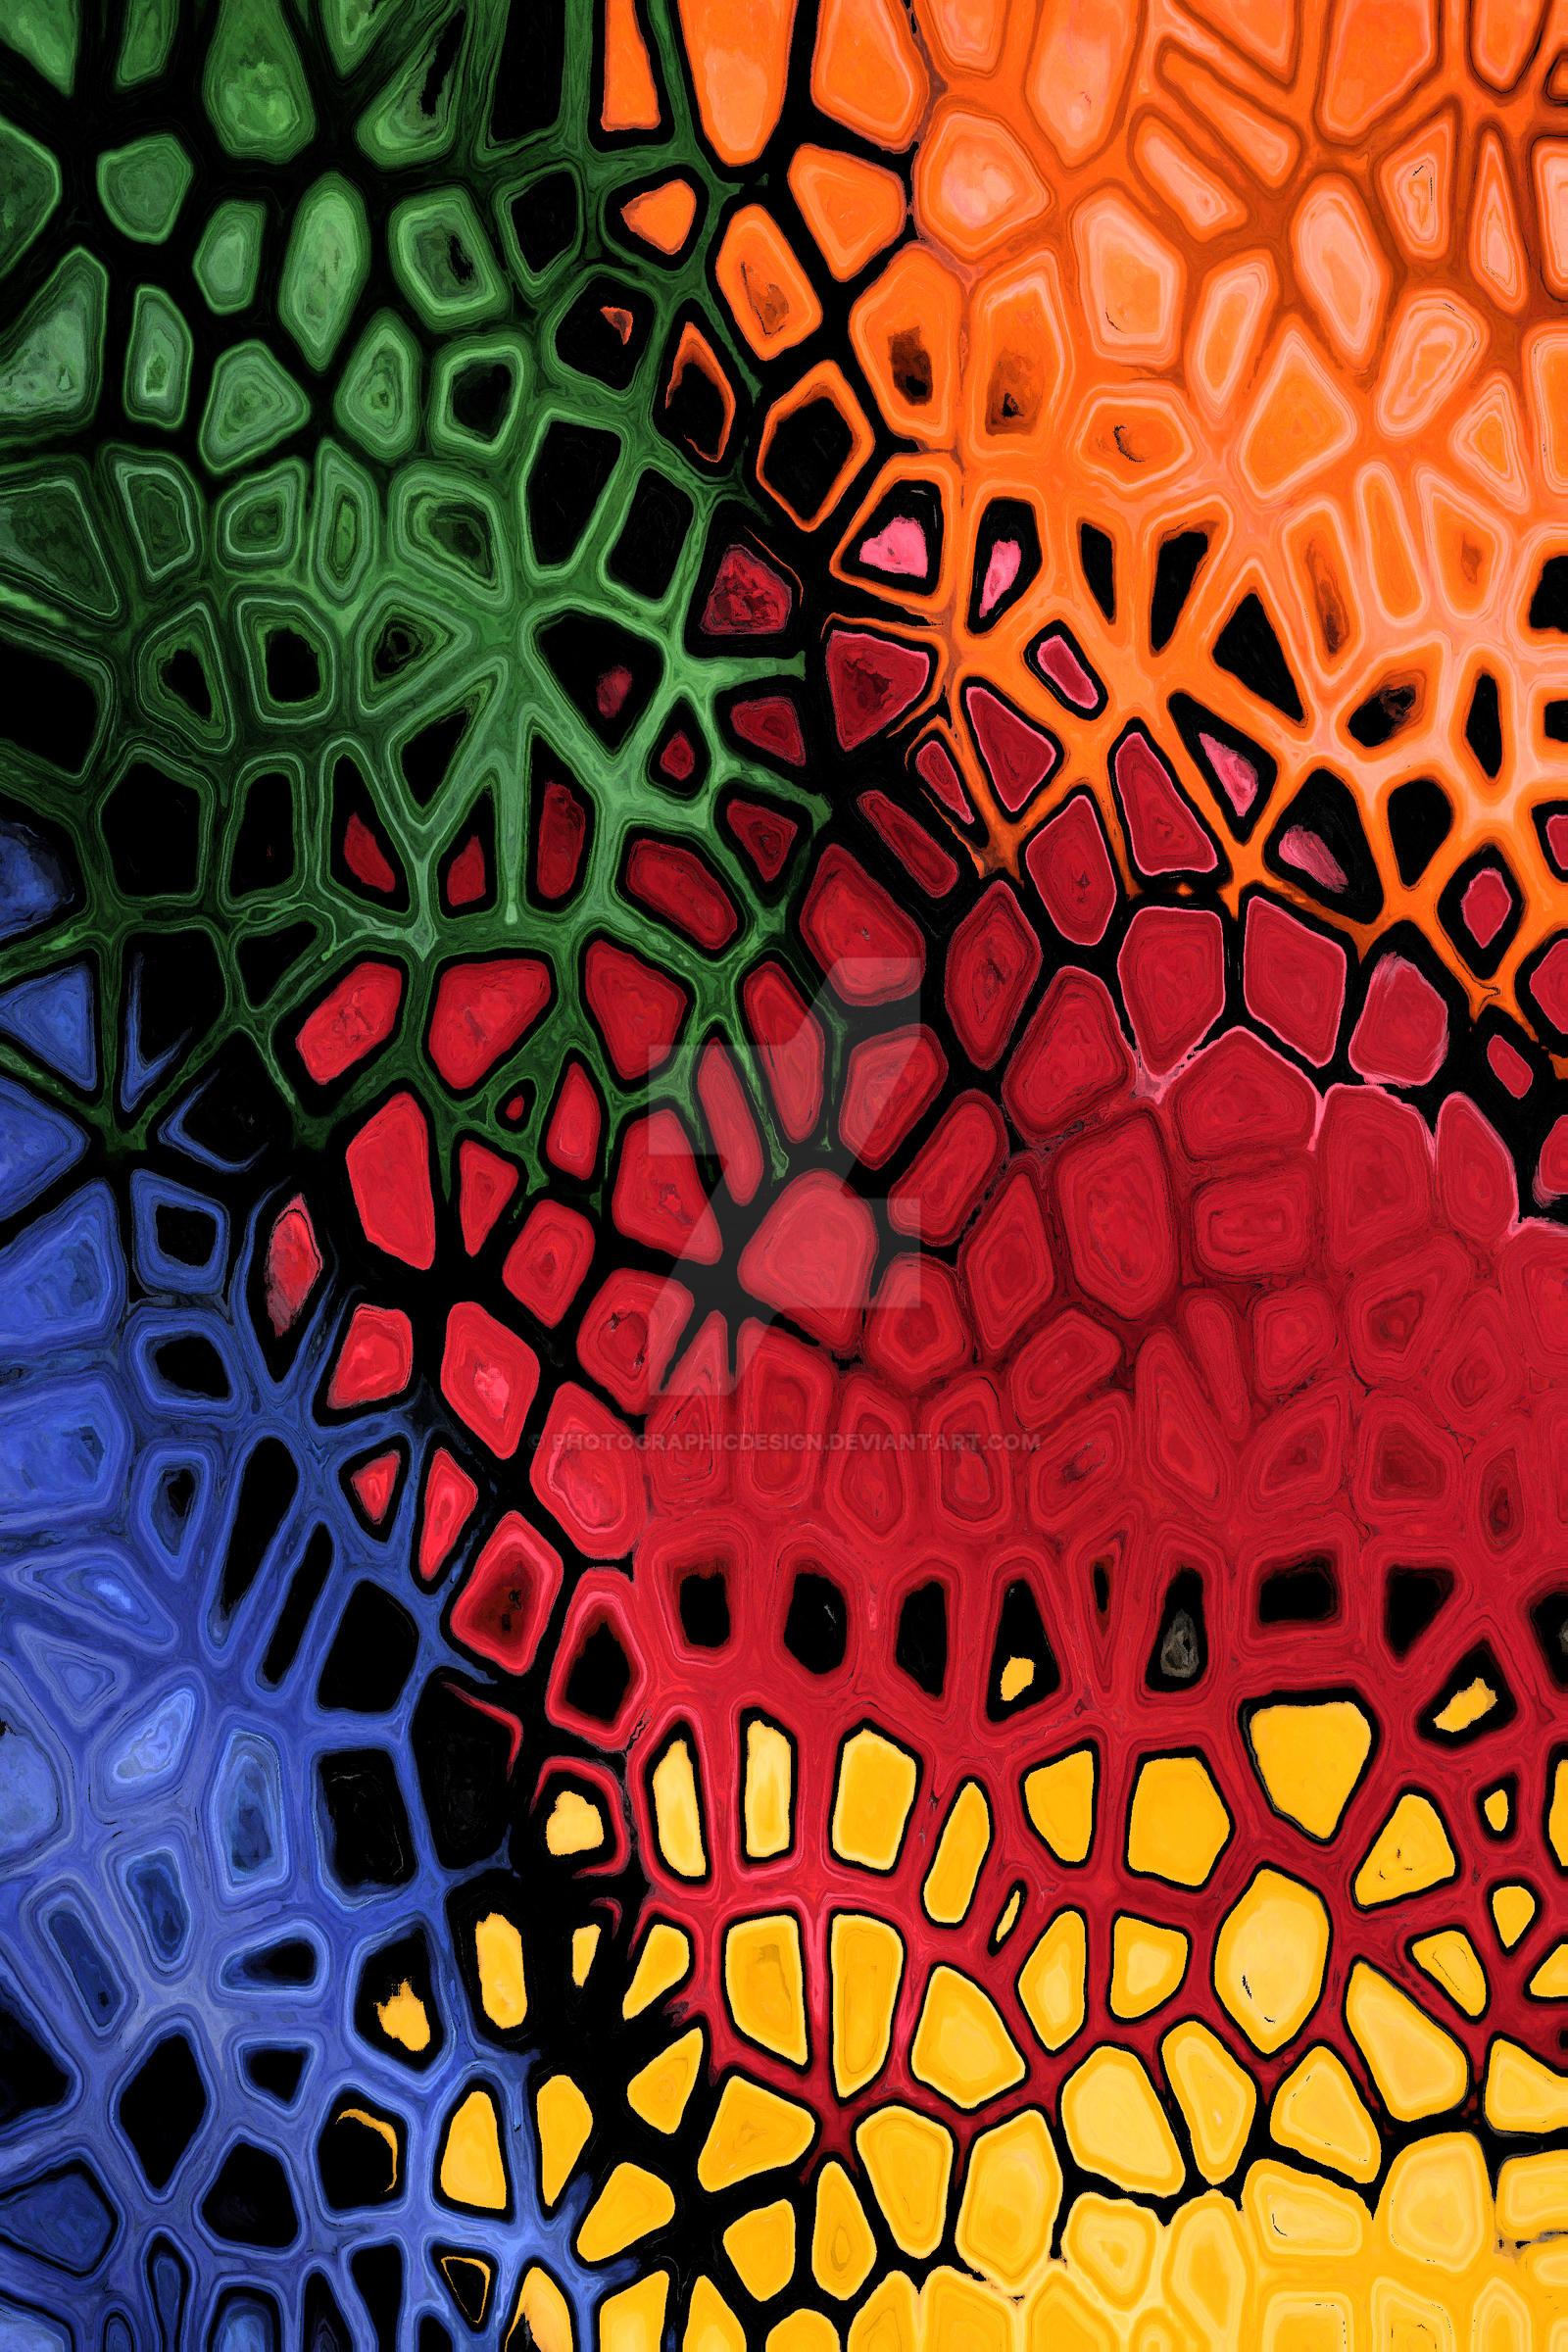 Crazy Colorful Designs Images